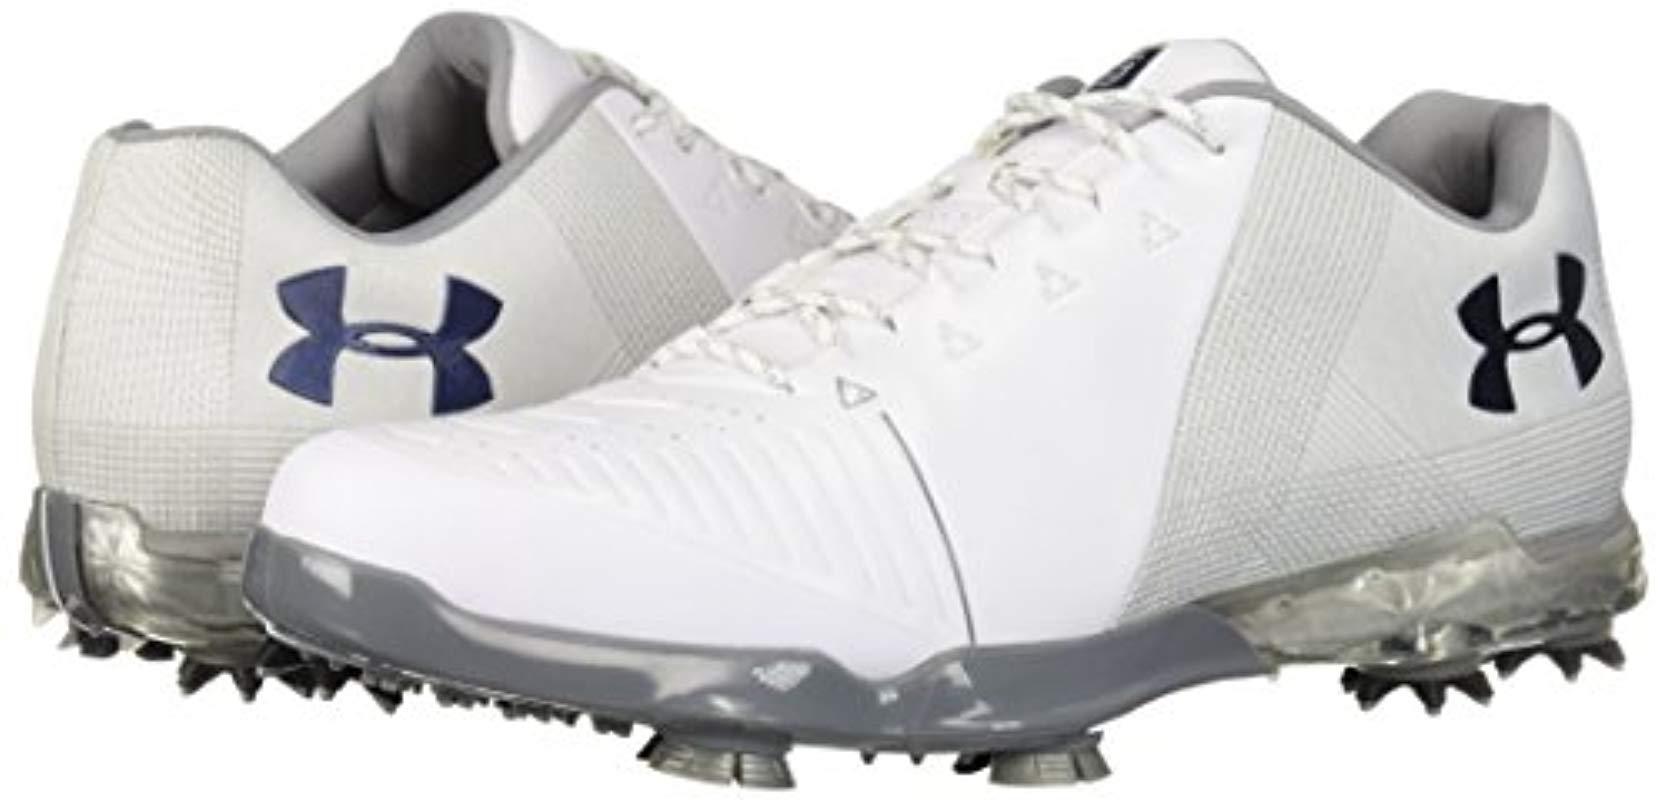 238b8295a25f5 Men's Metallic 2018 Ua Spieth 2 Waterproof S Spikes Golf Shoes